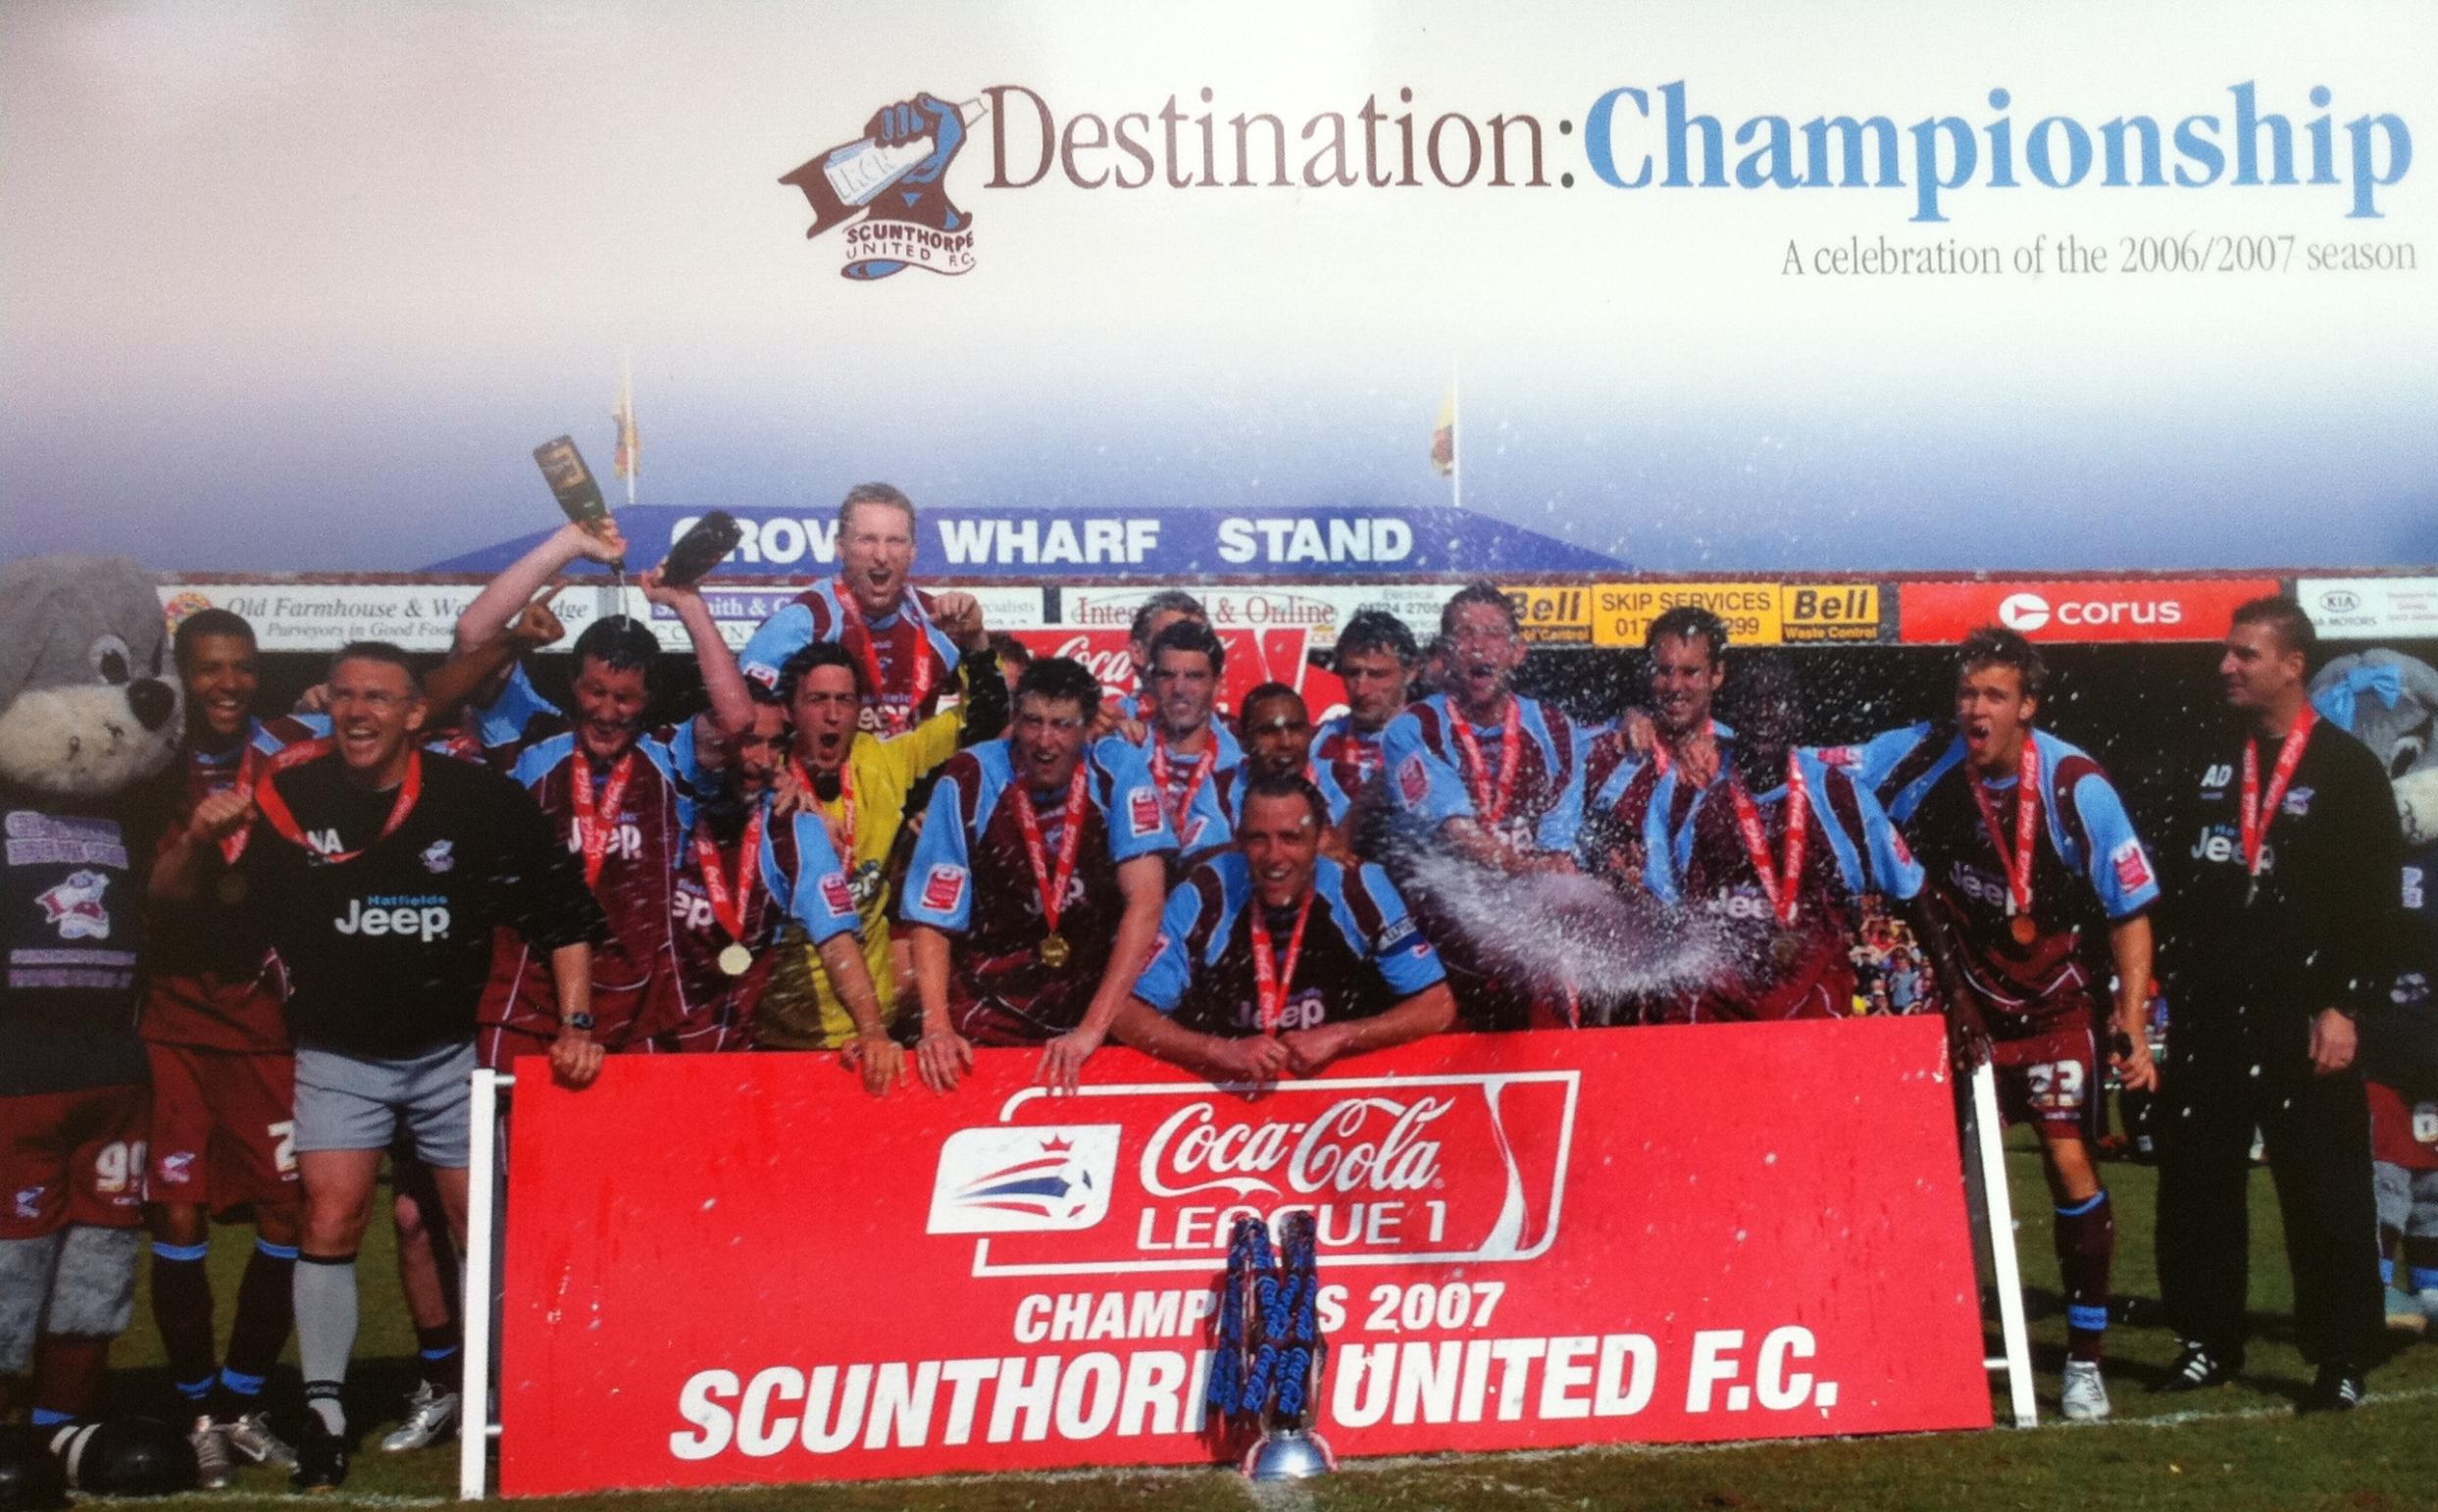 Scunthorpe United League 1 Champions 2007